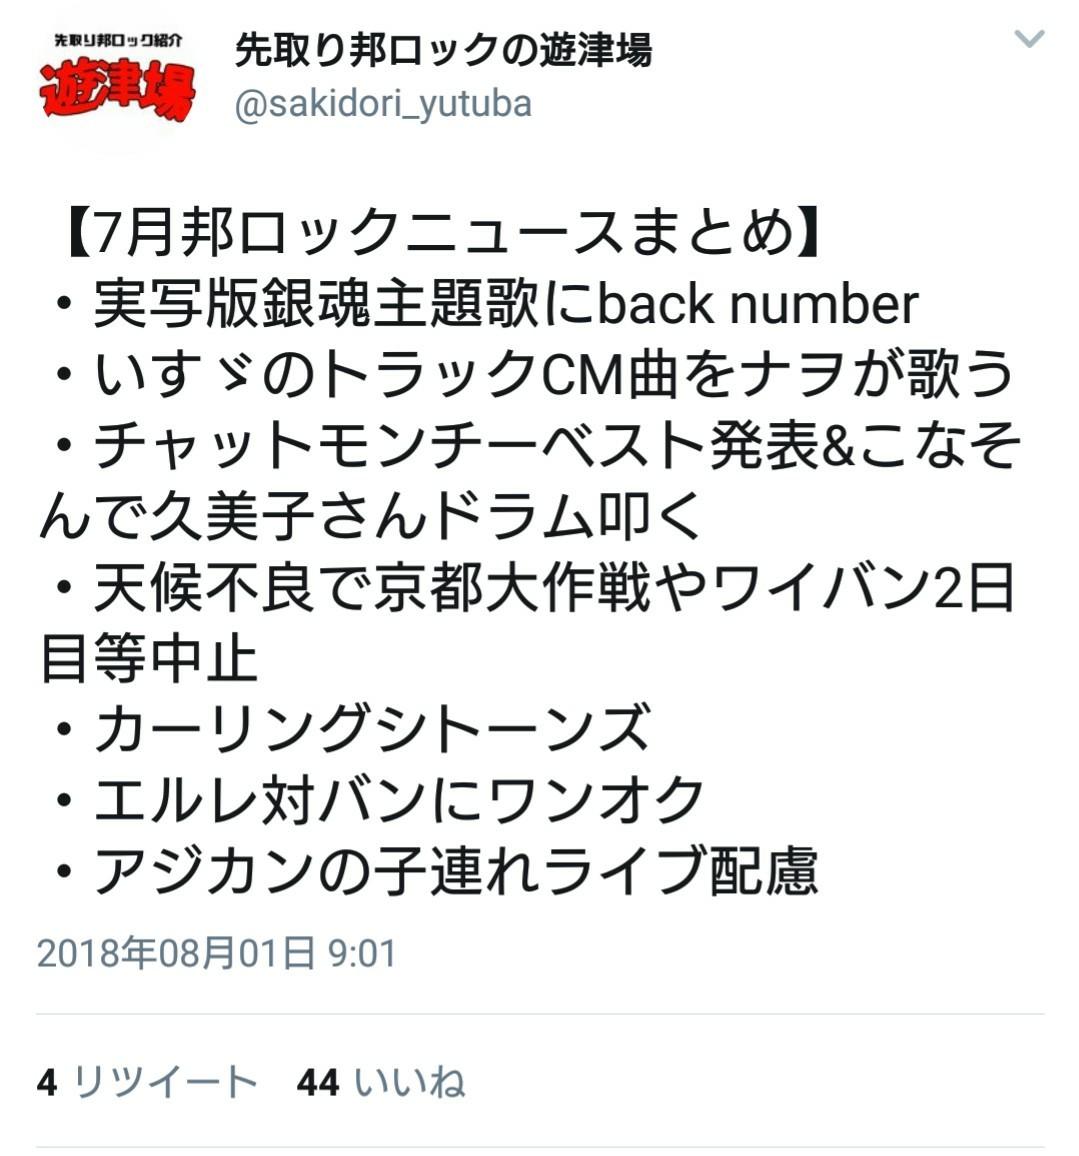 f:id:sakidoriyutsubarock:20181213223821j:plain